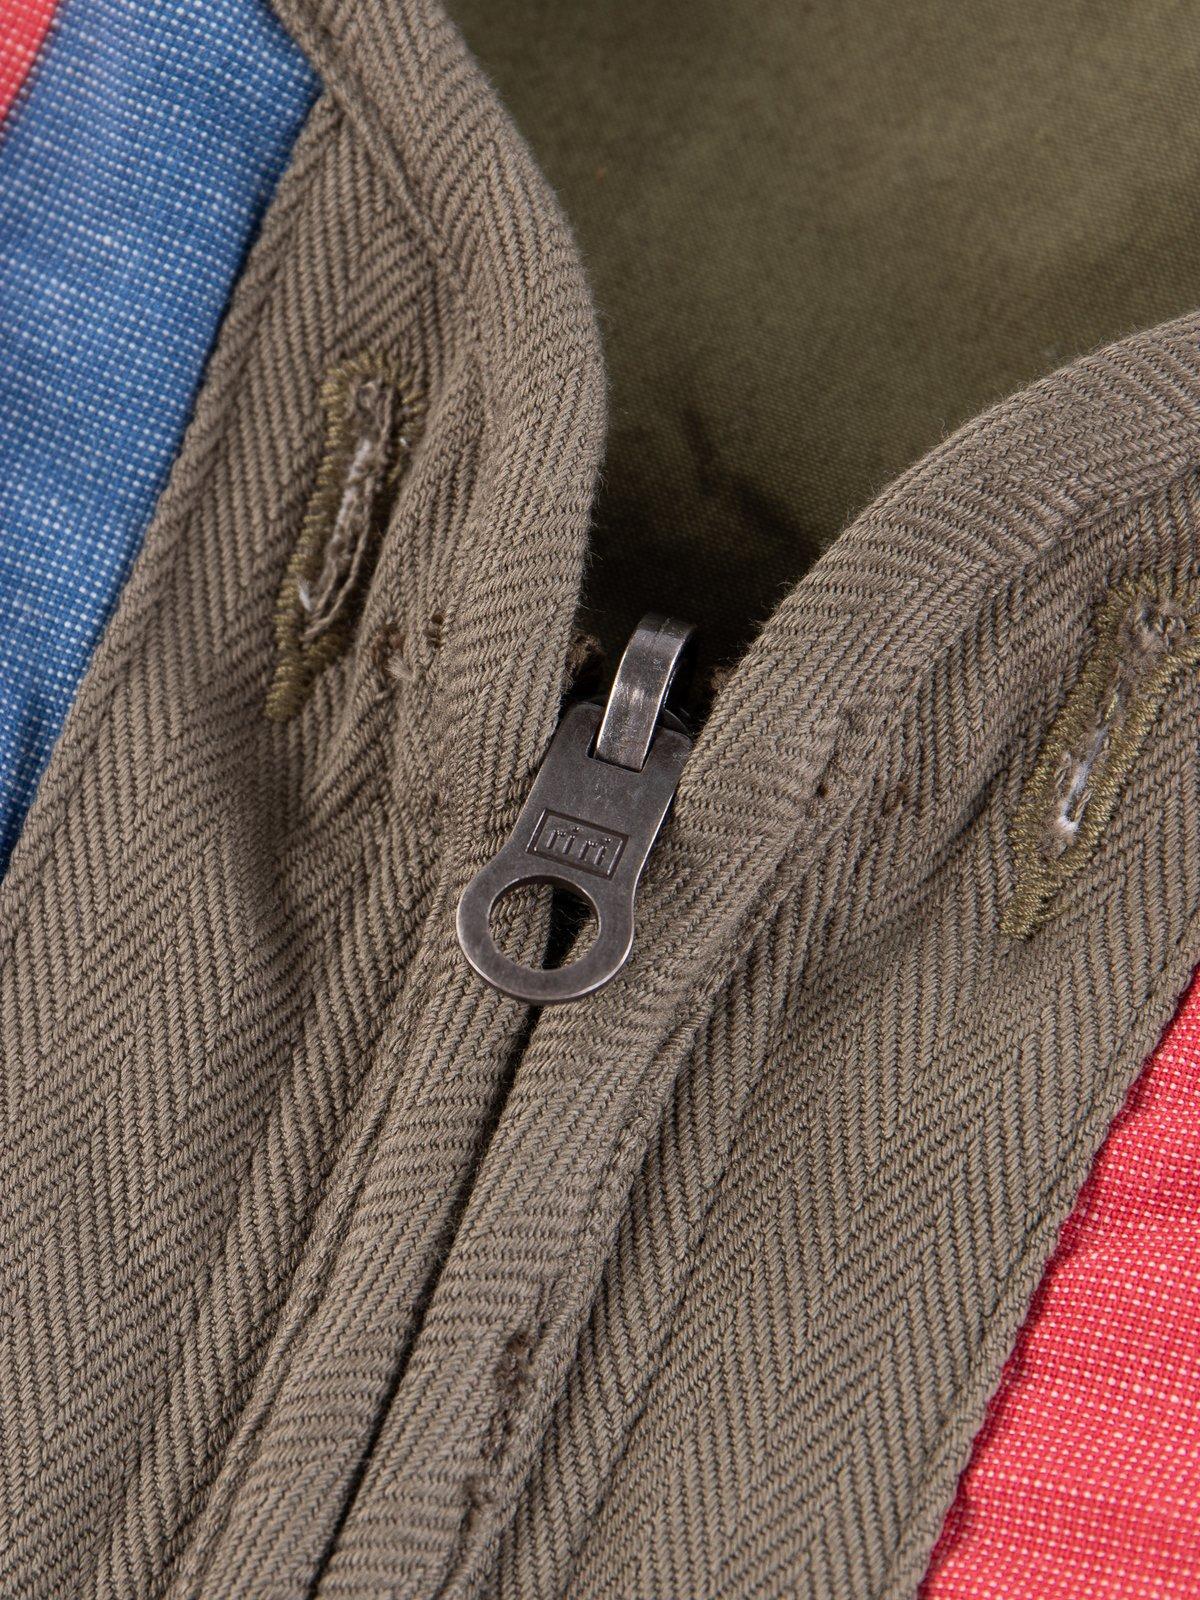 Olive Iris Cotton Liner Vest - Image 10